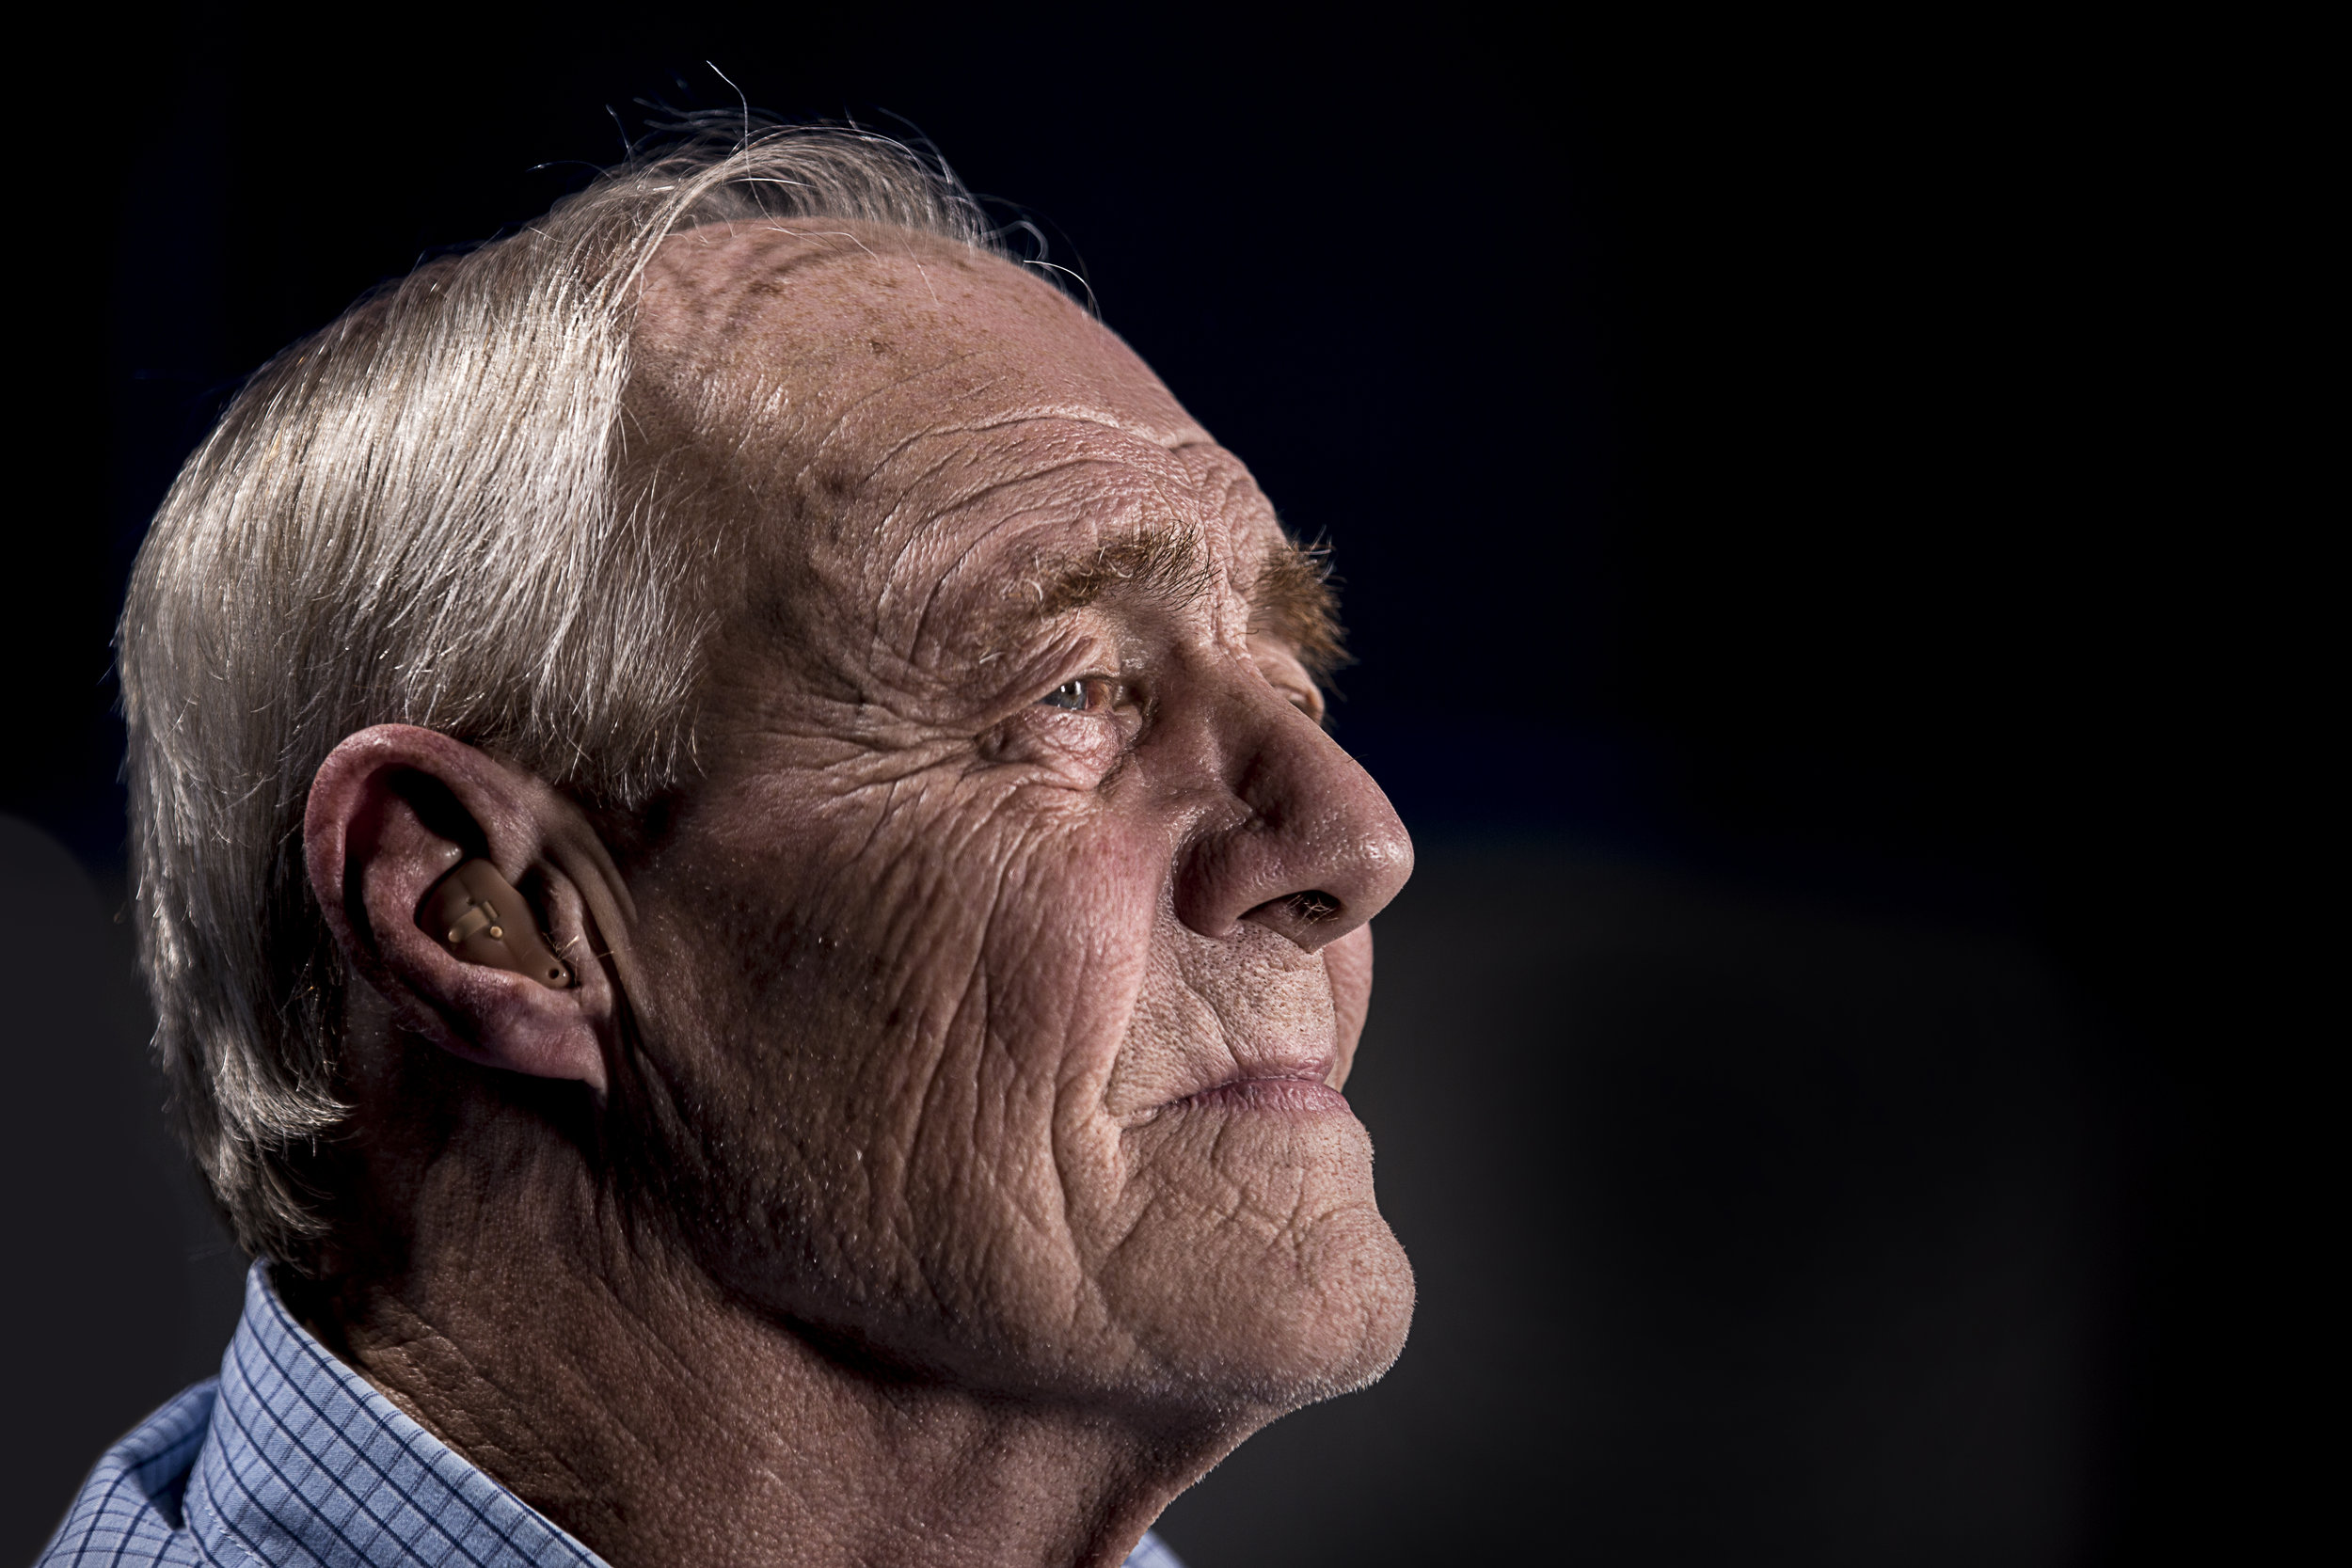 Photo of older adult gentleman by Unsplash.